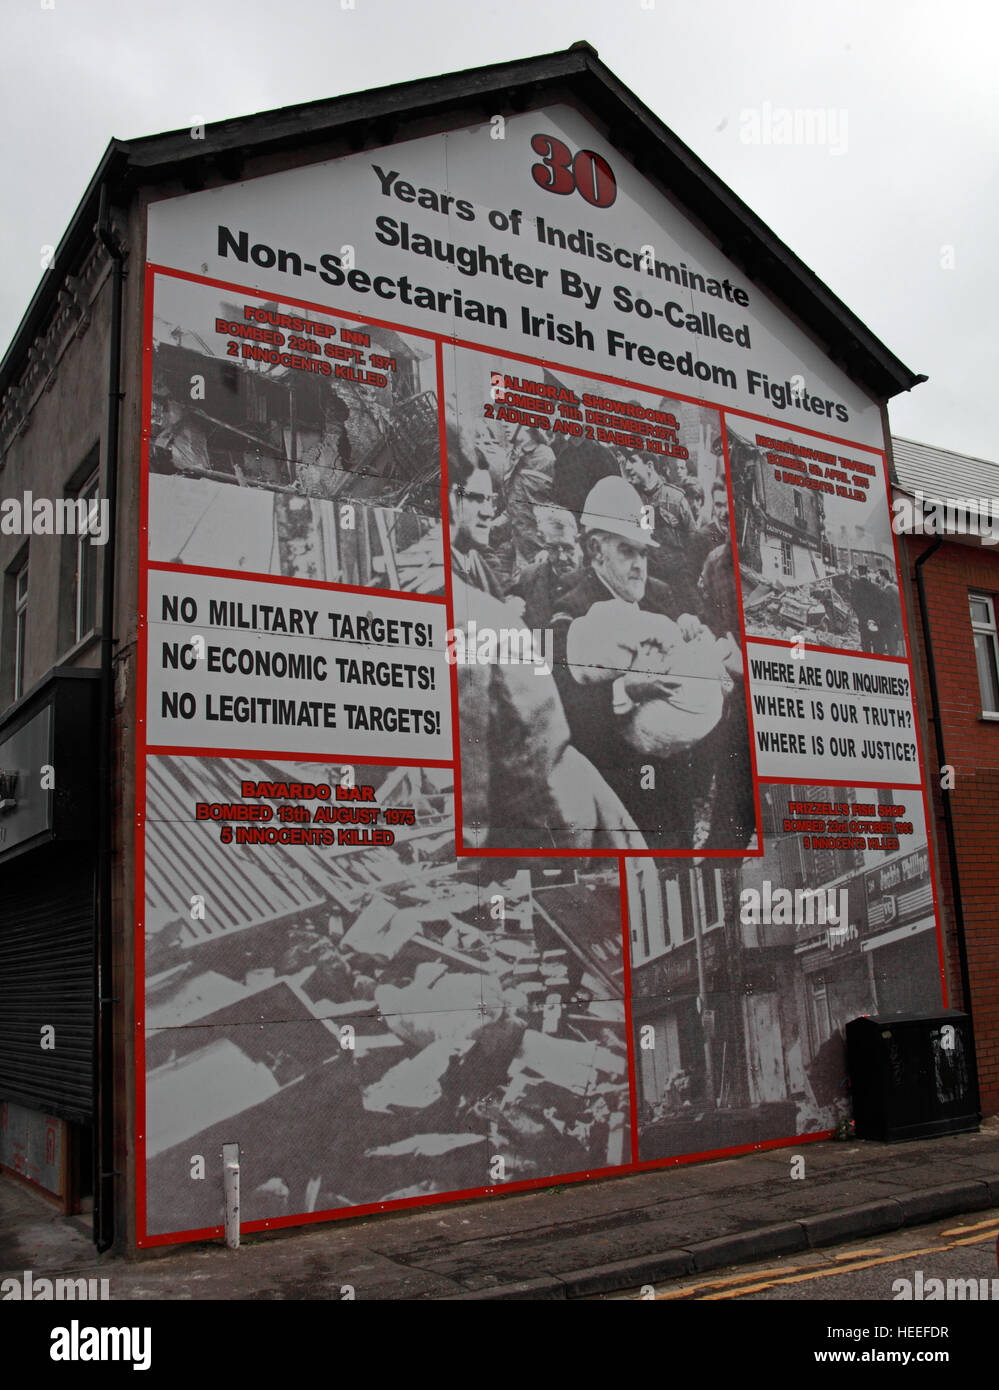 Belfast Unionist, Loyalist Mural Bayardo Bar,Aberdeen St, attack slaughter by IRA Brendan McFarlane - Stock Image